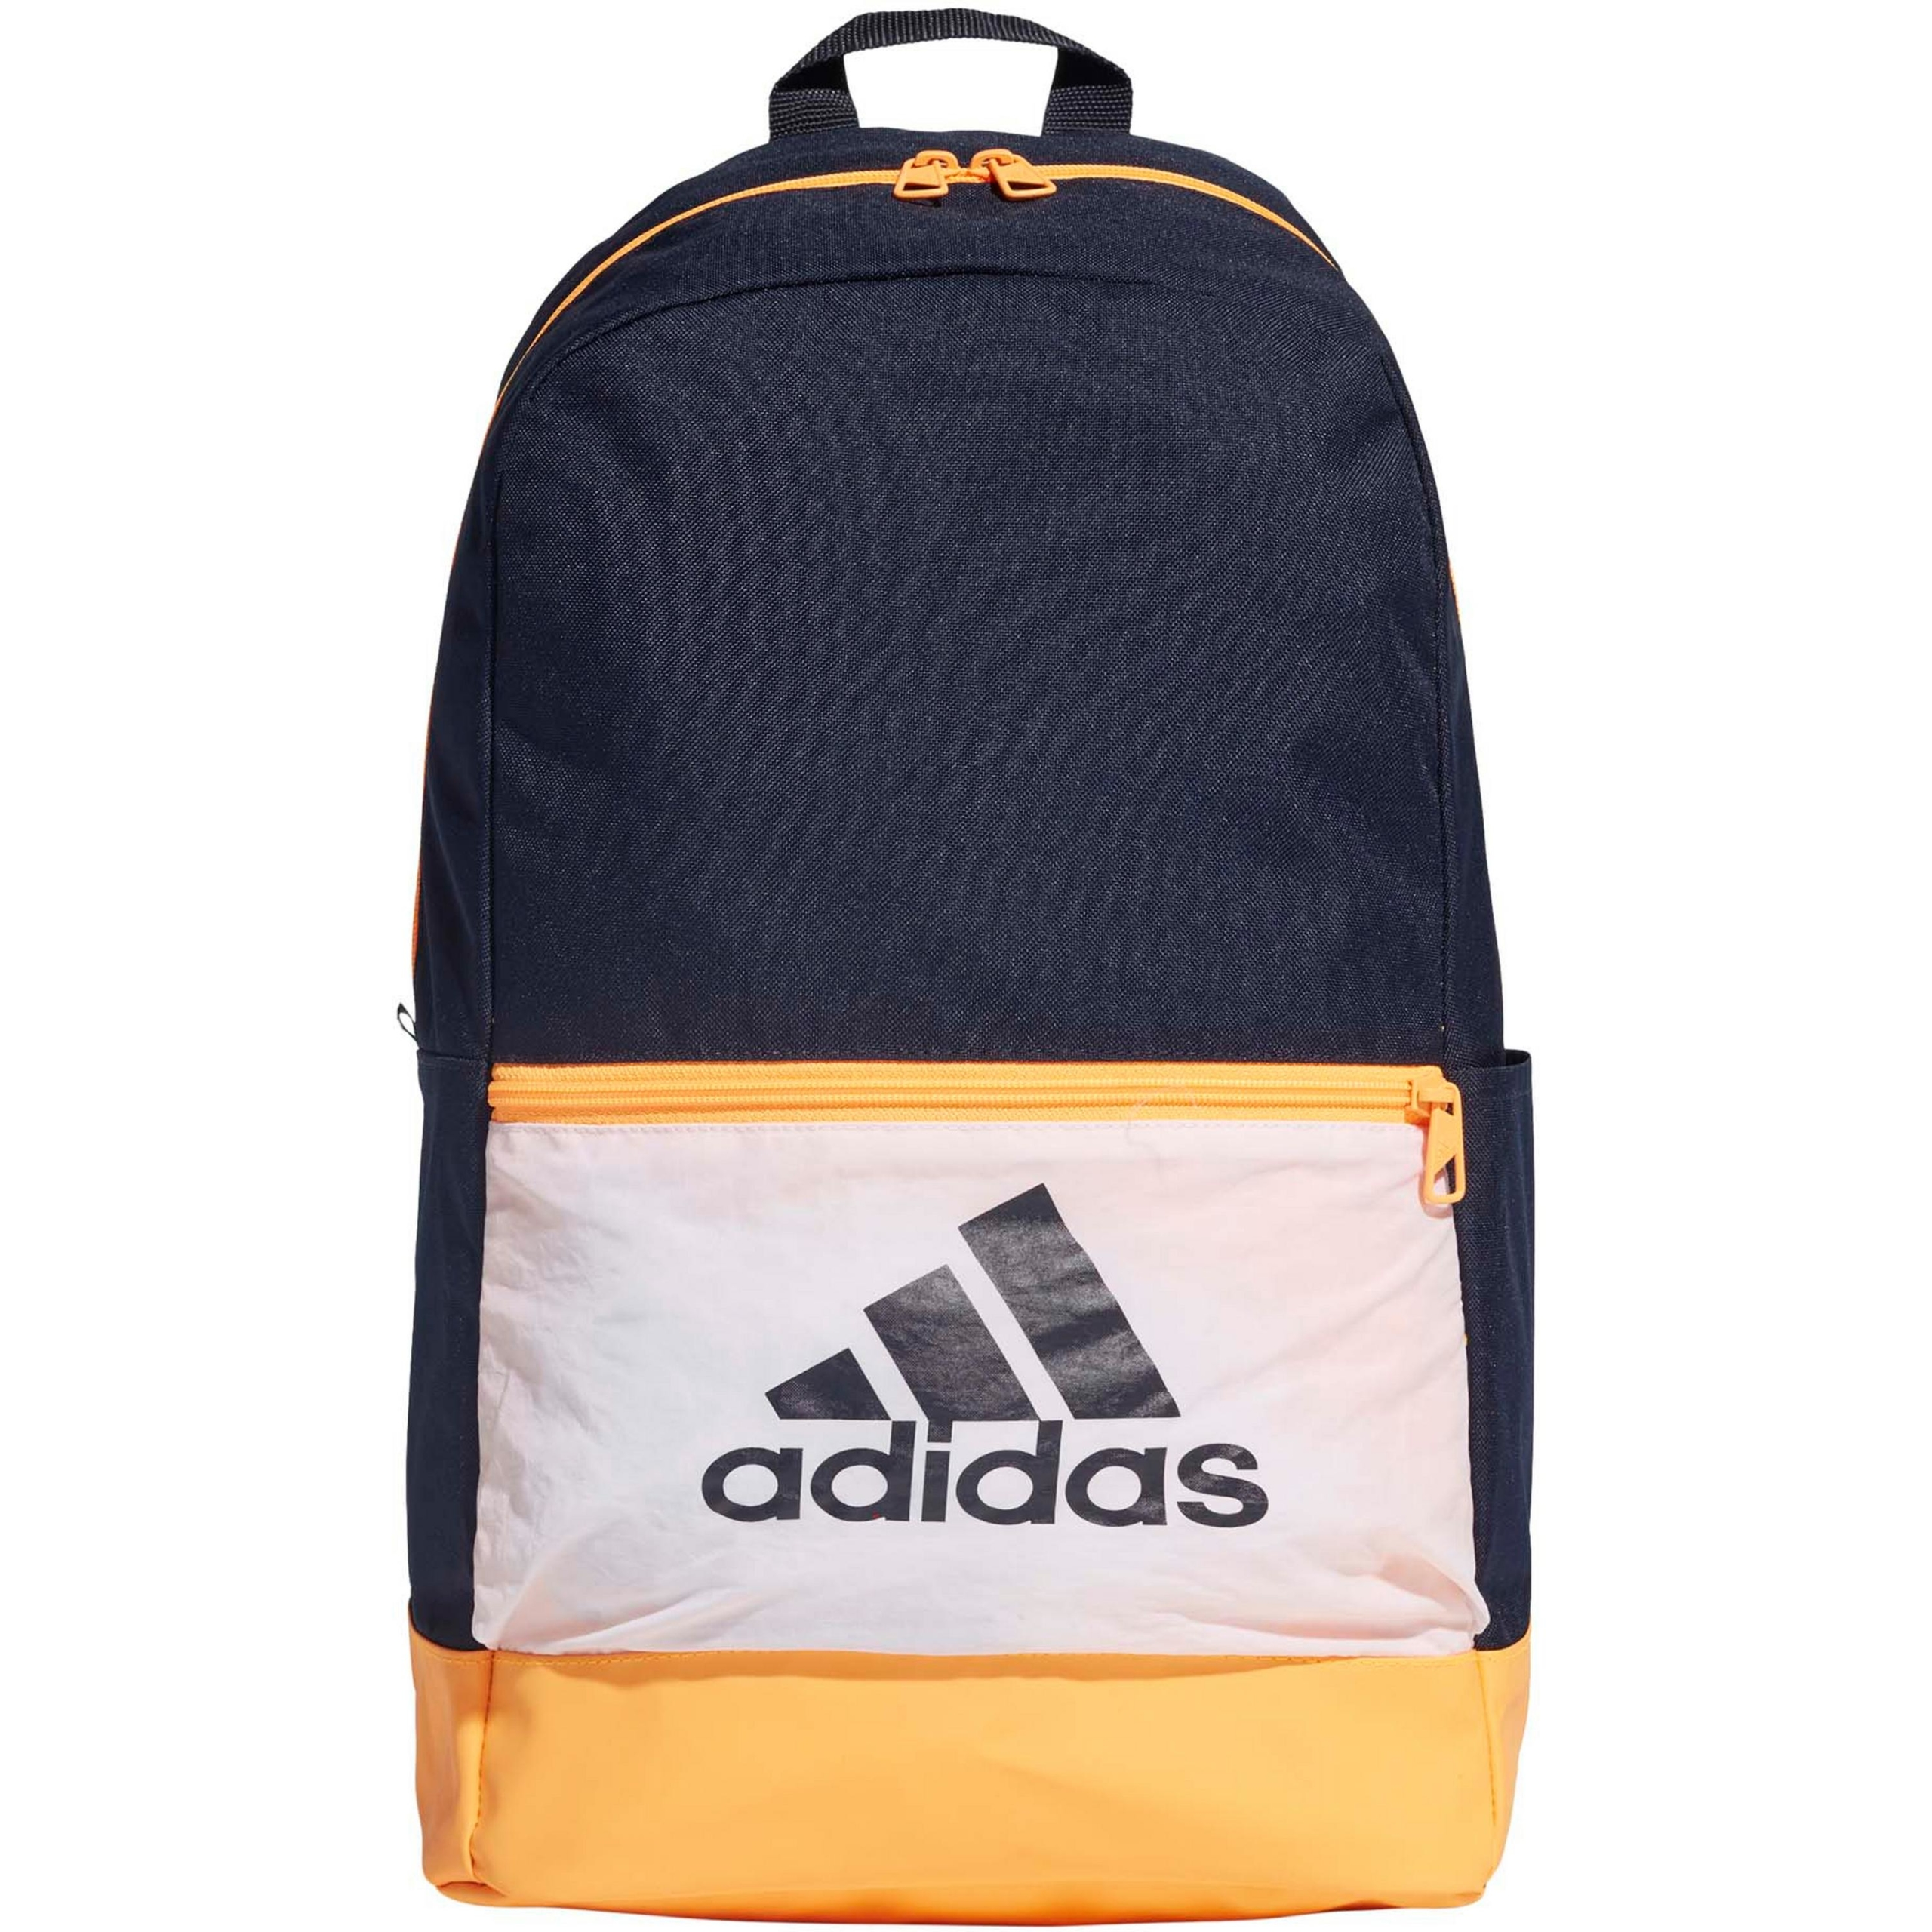 adidas Classic Daypack Kinder